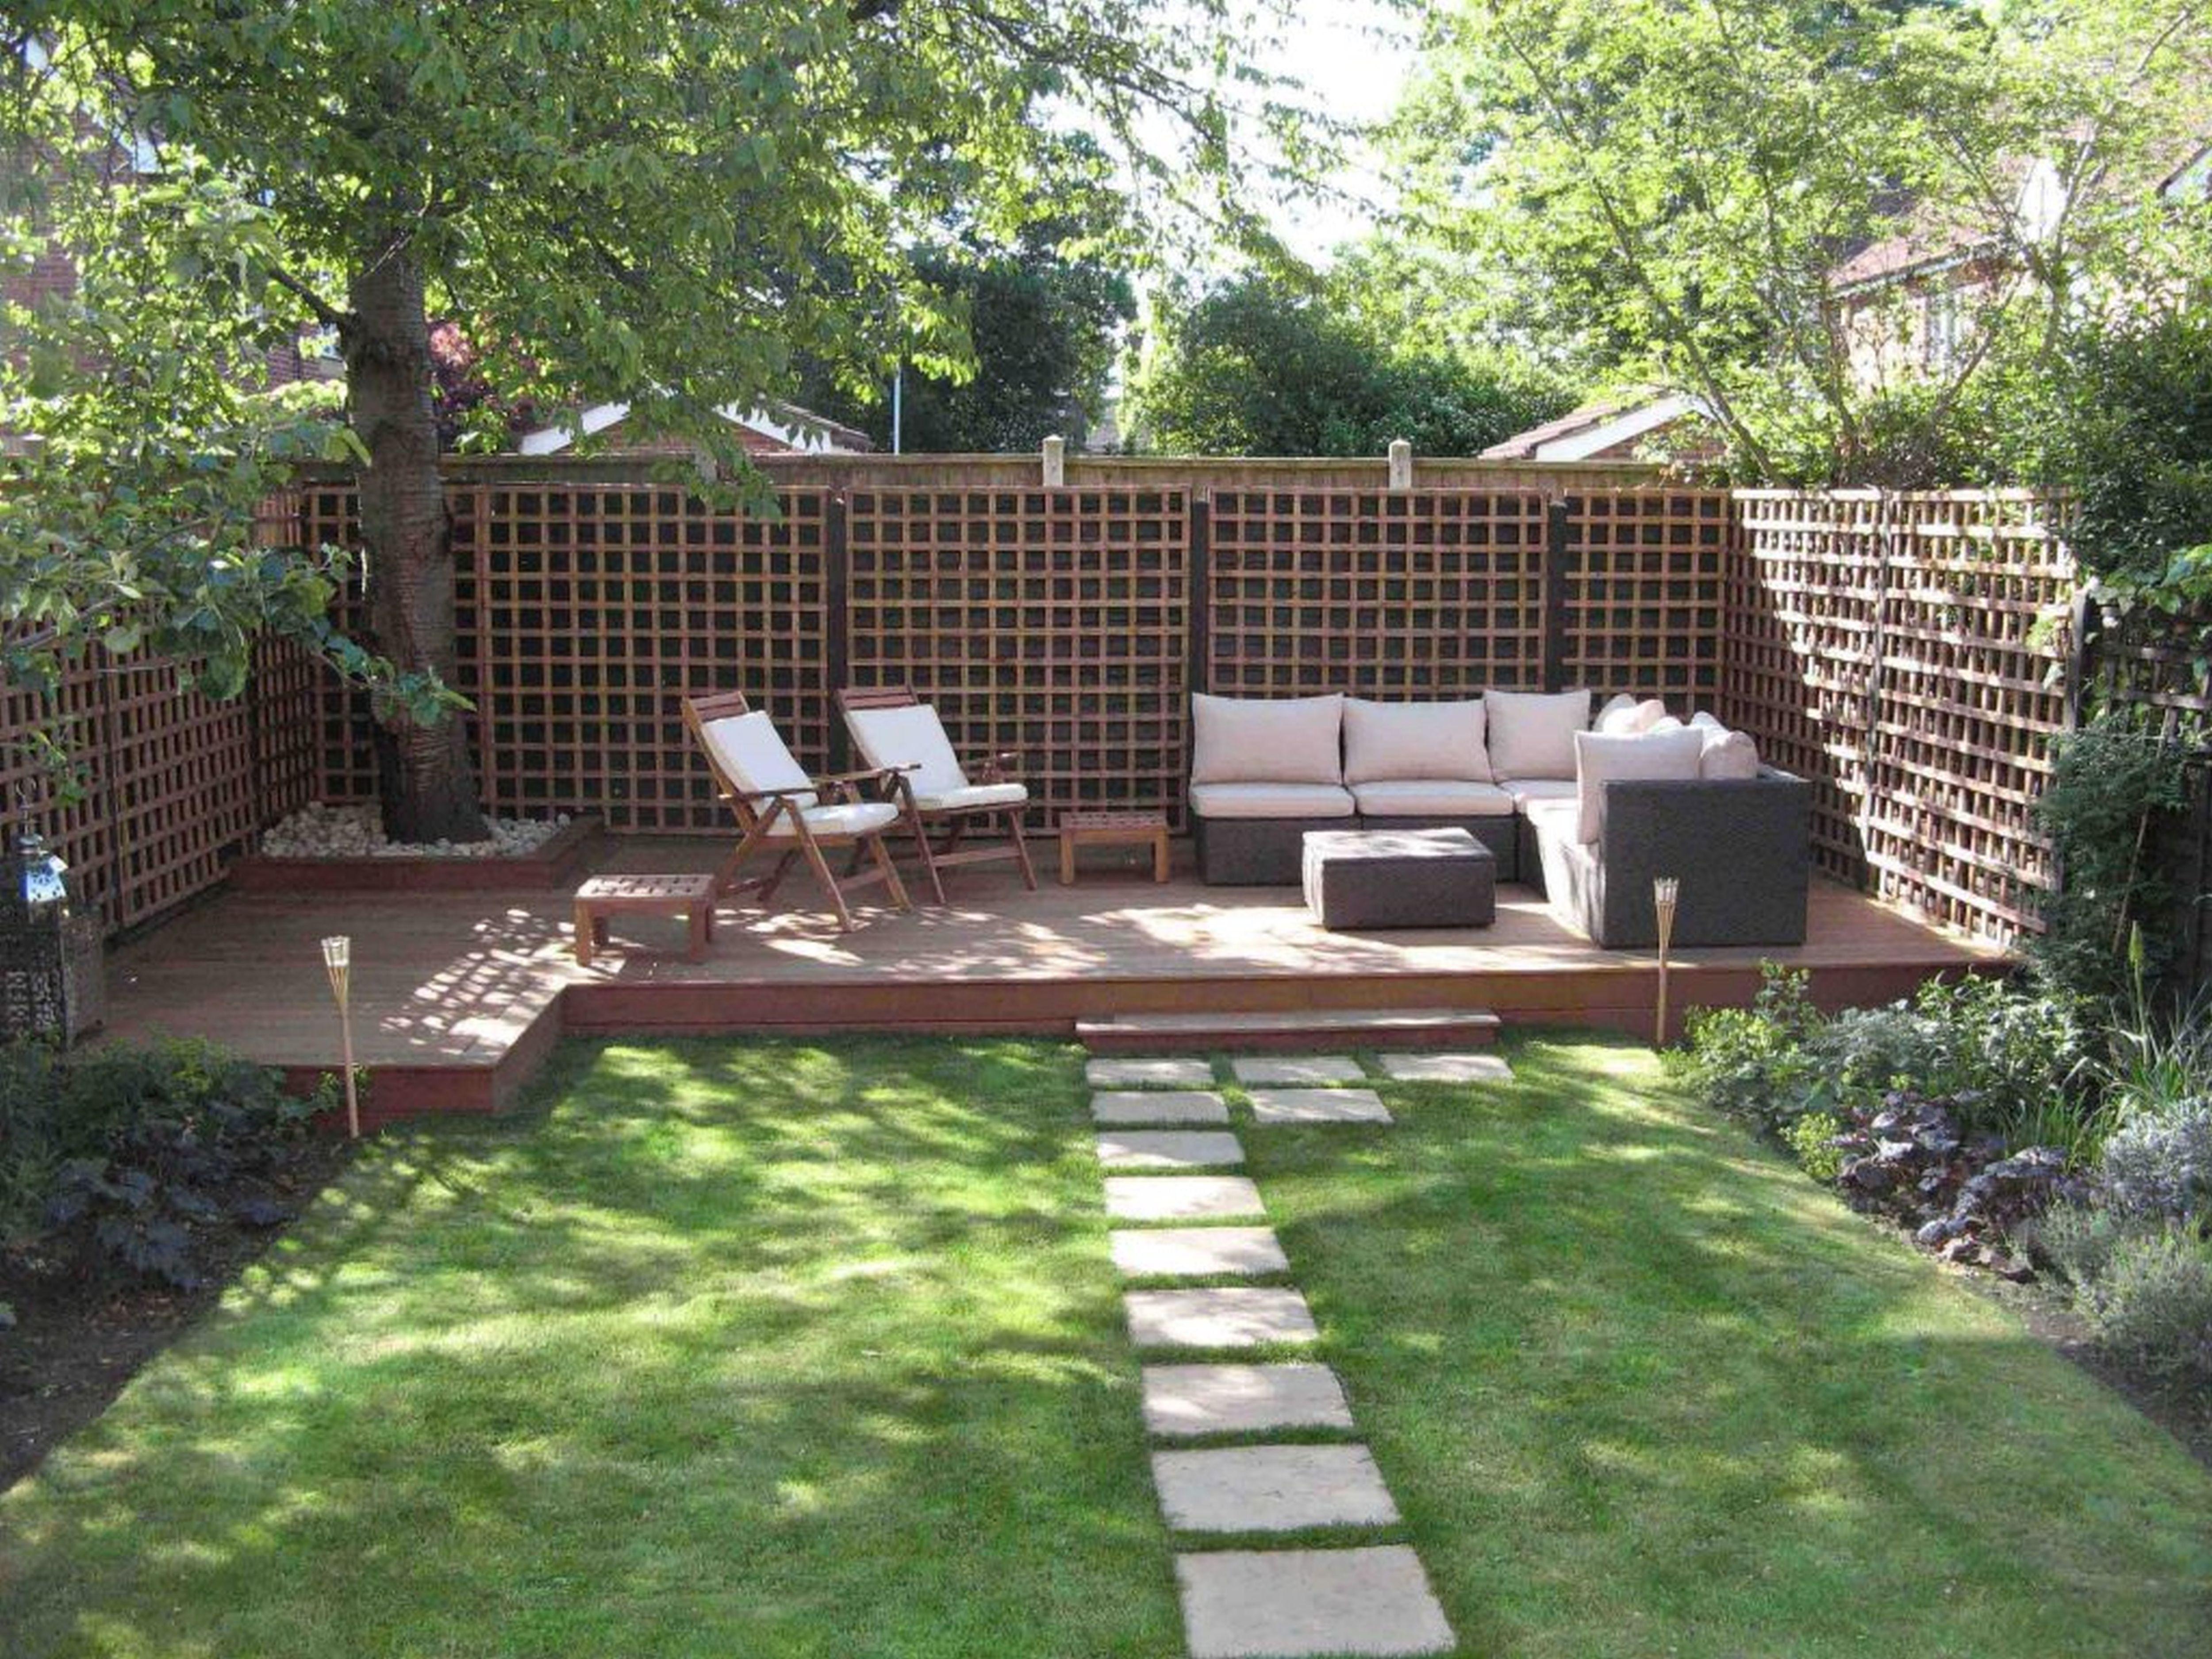 backyard landscape design plans. Exterior-landscape-design-plans-cool-design-ideas-of-backyard-landscaping -with-brown-wooden-decks-and-stone-garden-path-also-green-grass-wicker-outdoor- Backyard Landscape Design Plans G